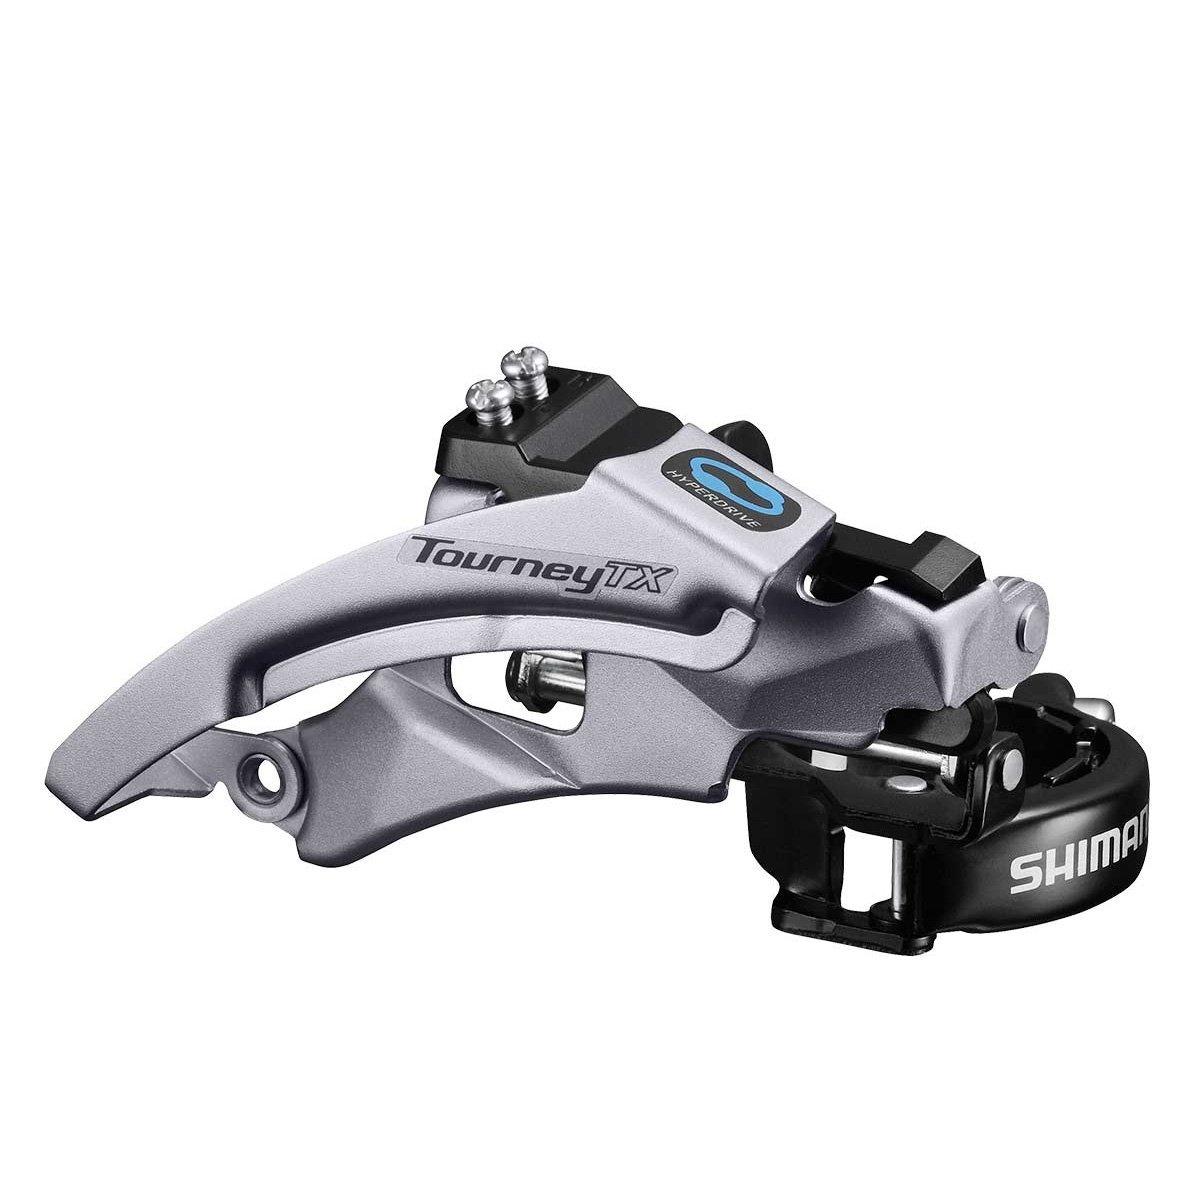 Shimano Tourney FD-A070 Road Bike 7 Speed Double Front Derailleur 28.6//34.9mm